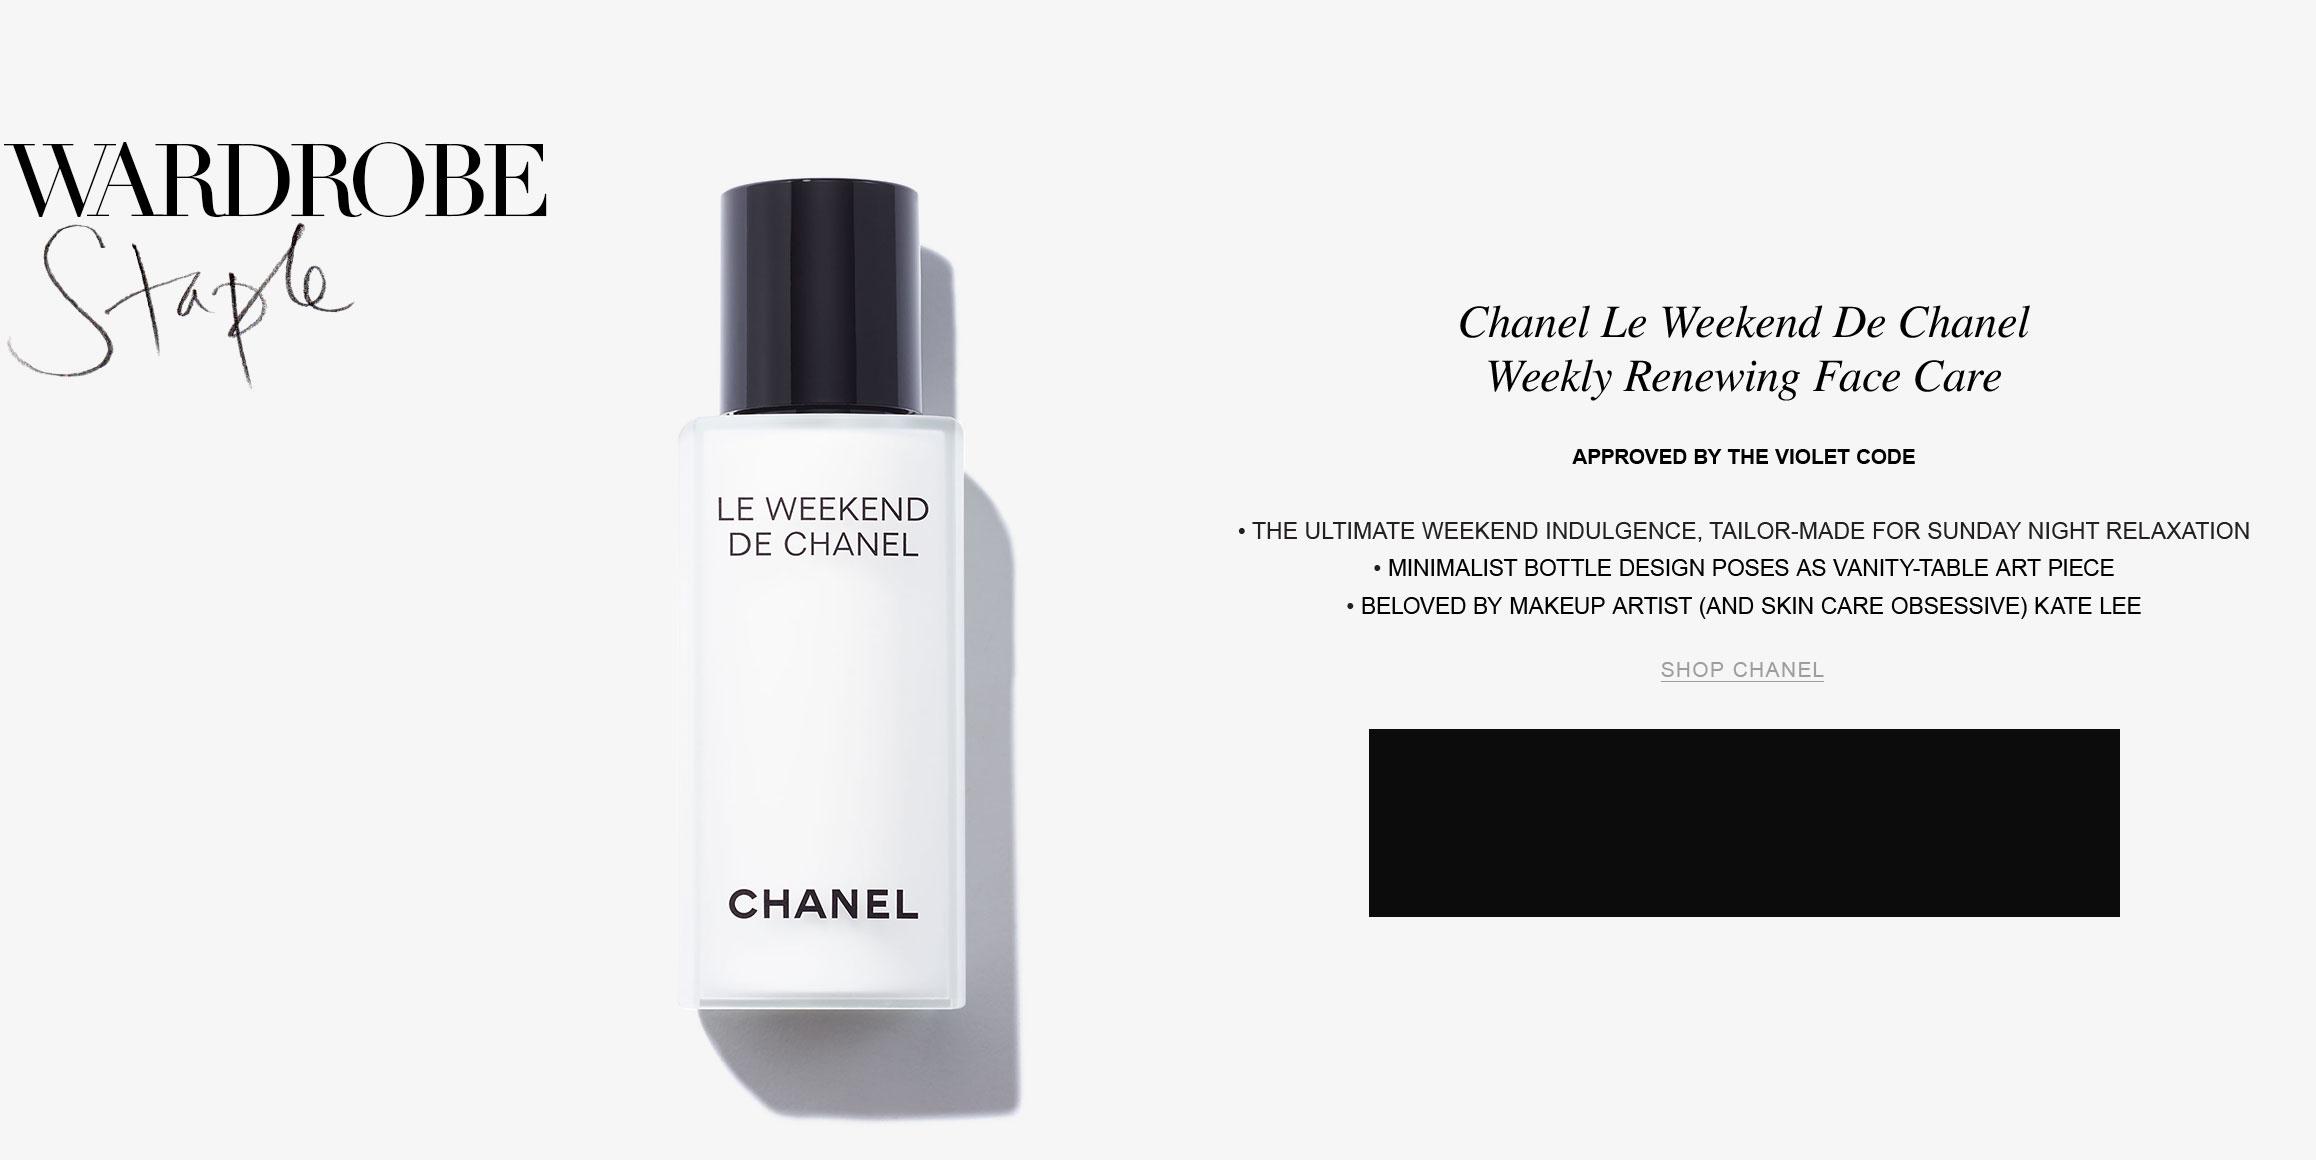 CHANEL-LE-WEEKEND-DE-CHANEL-WEEKLY-RENEWING-FACE-CARE-Interstitial.jpg